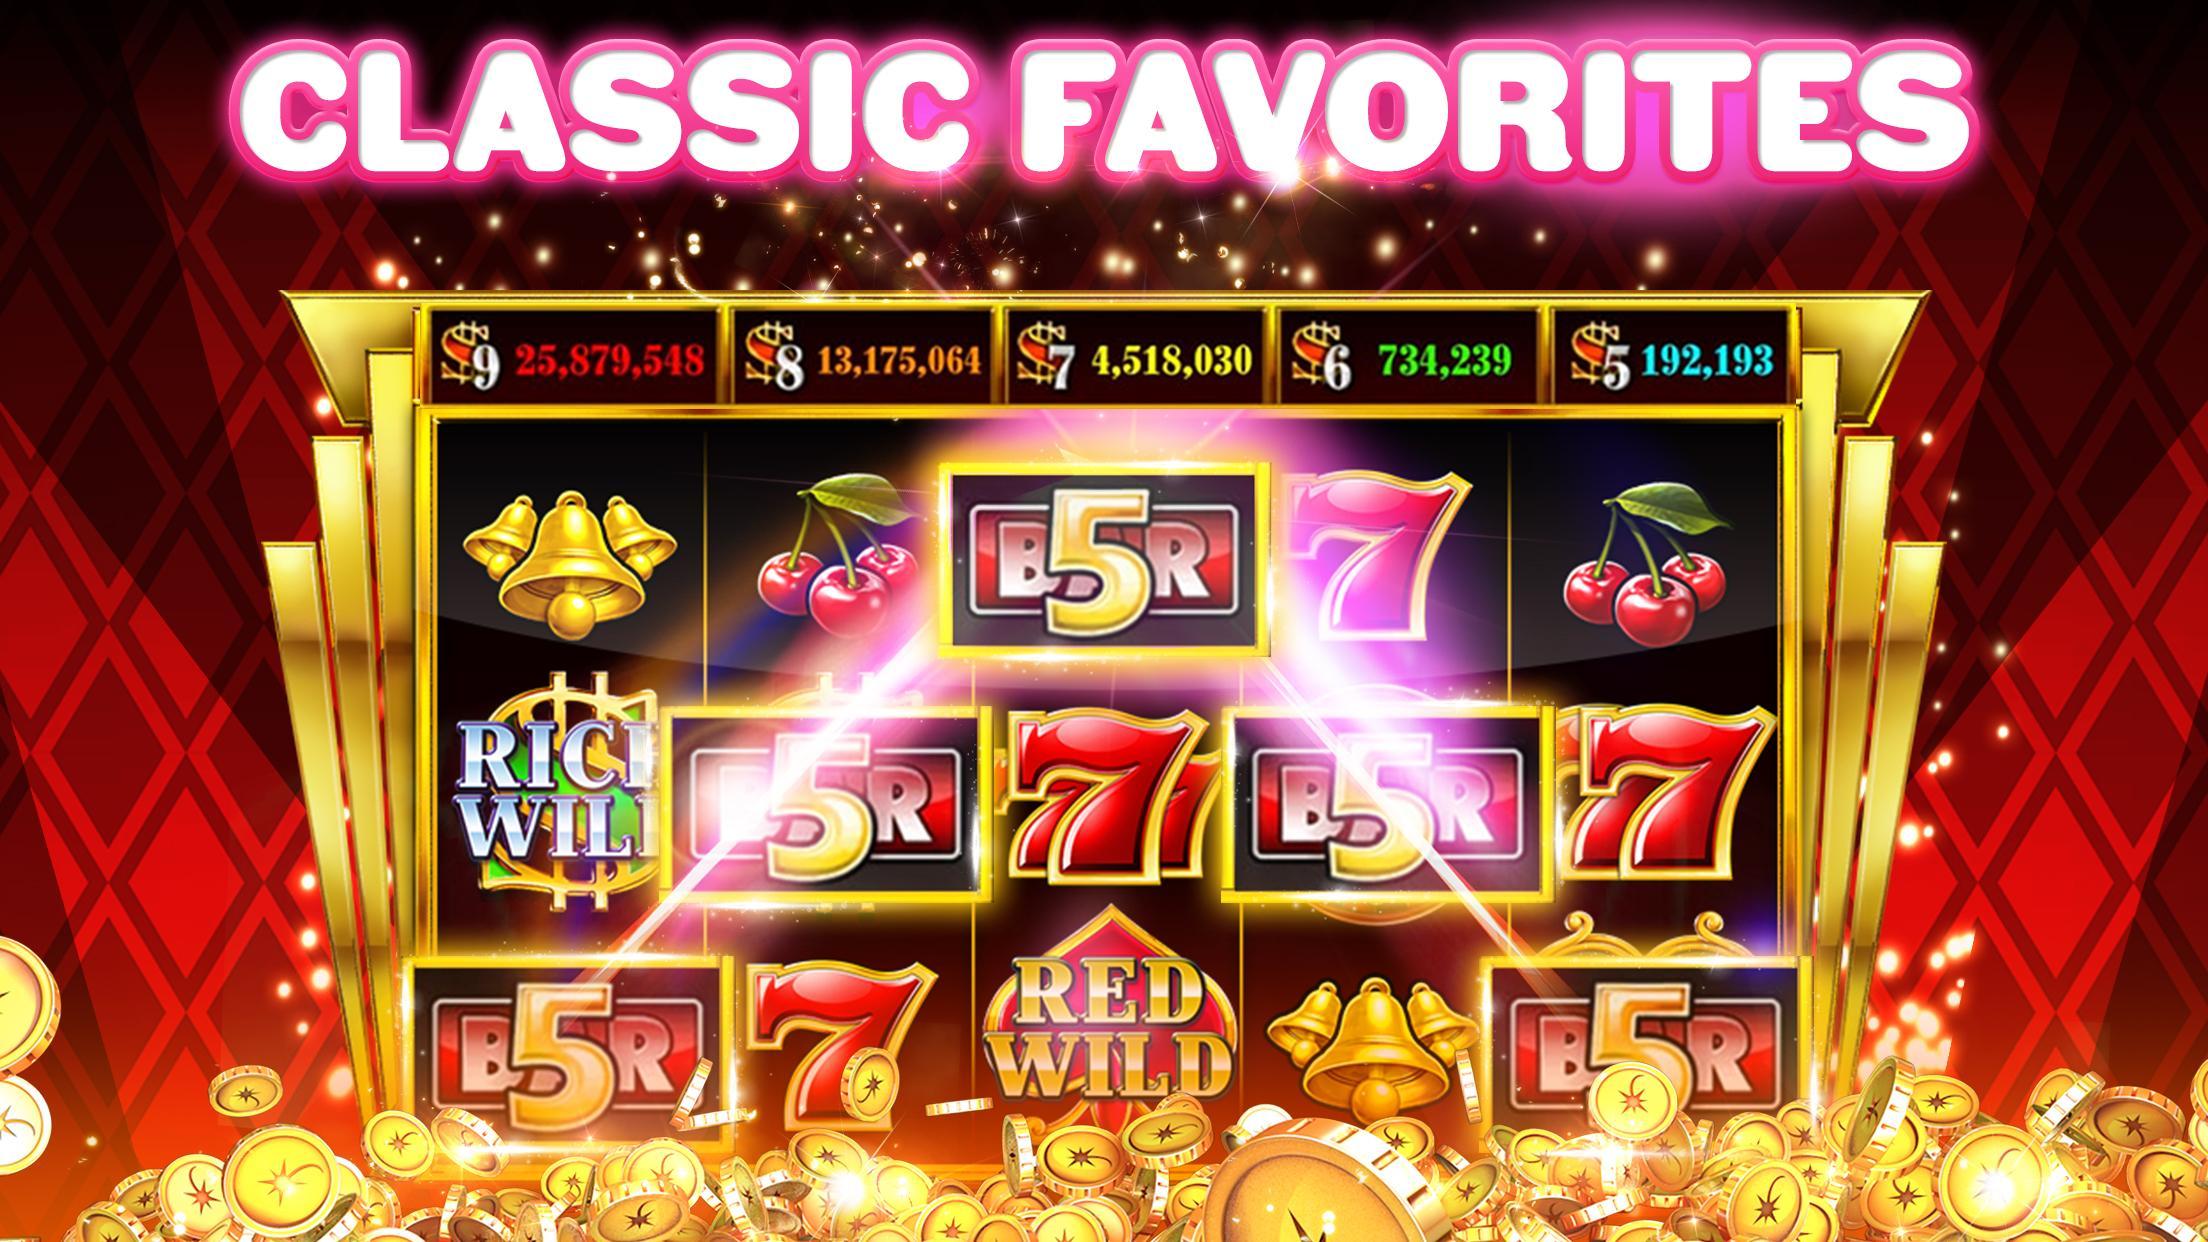 Jackpotjoy Slots Slot machines with Bonus Games 26.0.05 Screenshot 9